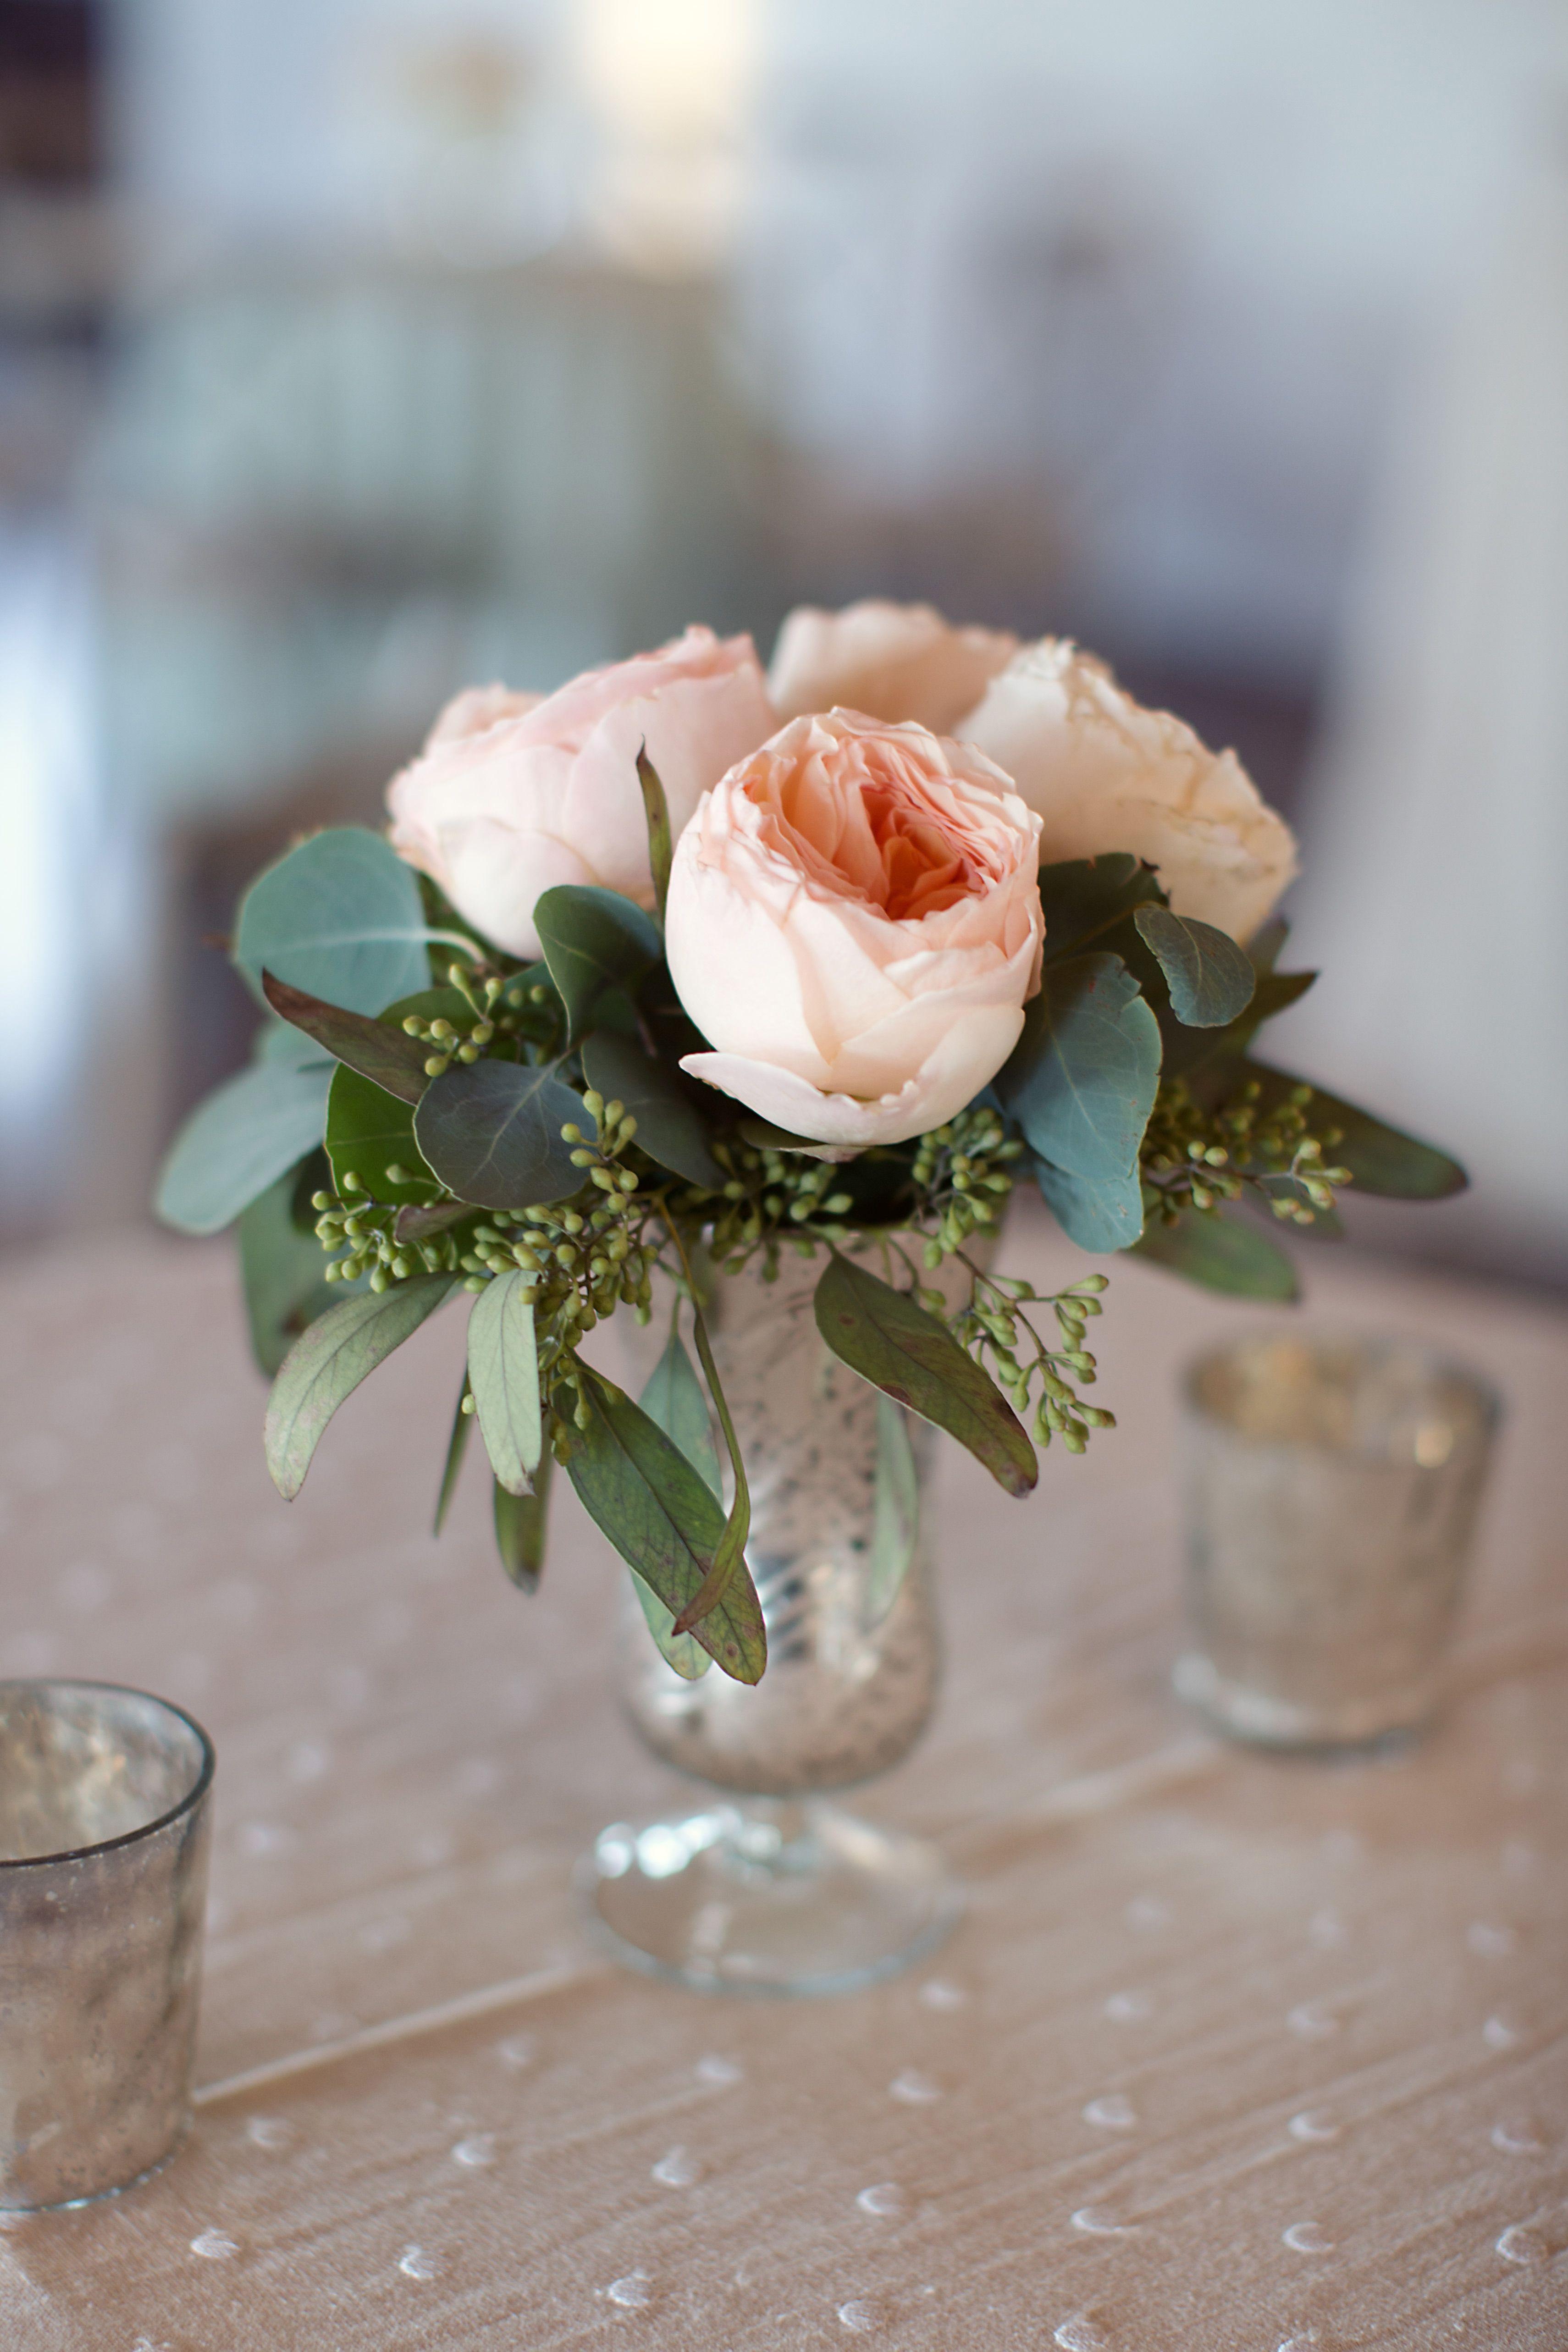 Simple But Elegant Table Arrangement! #bflive Read More:  Http://www.stylemepretty.com/2014/05/06/urban English Garden Inspired Wedding/